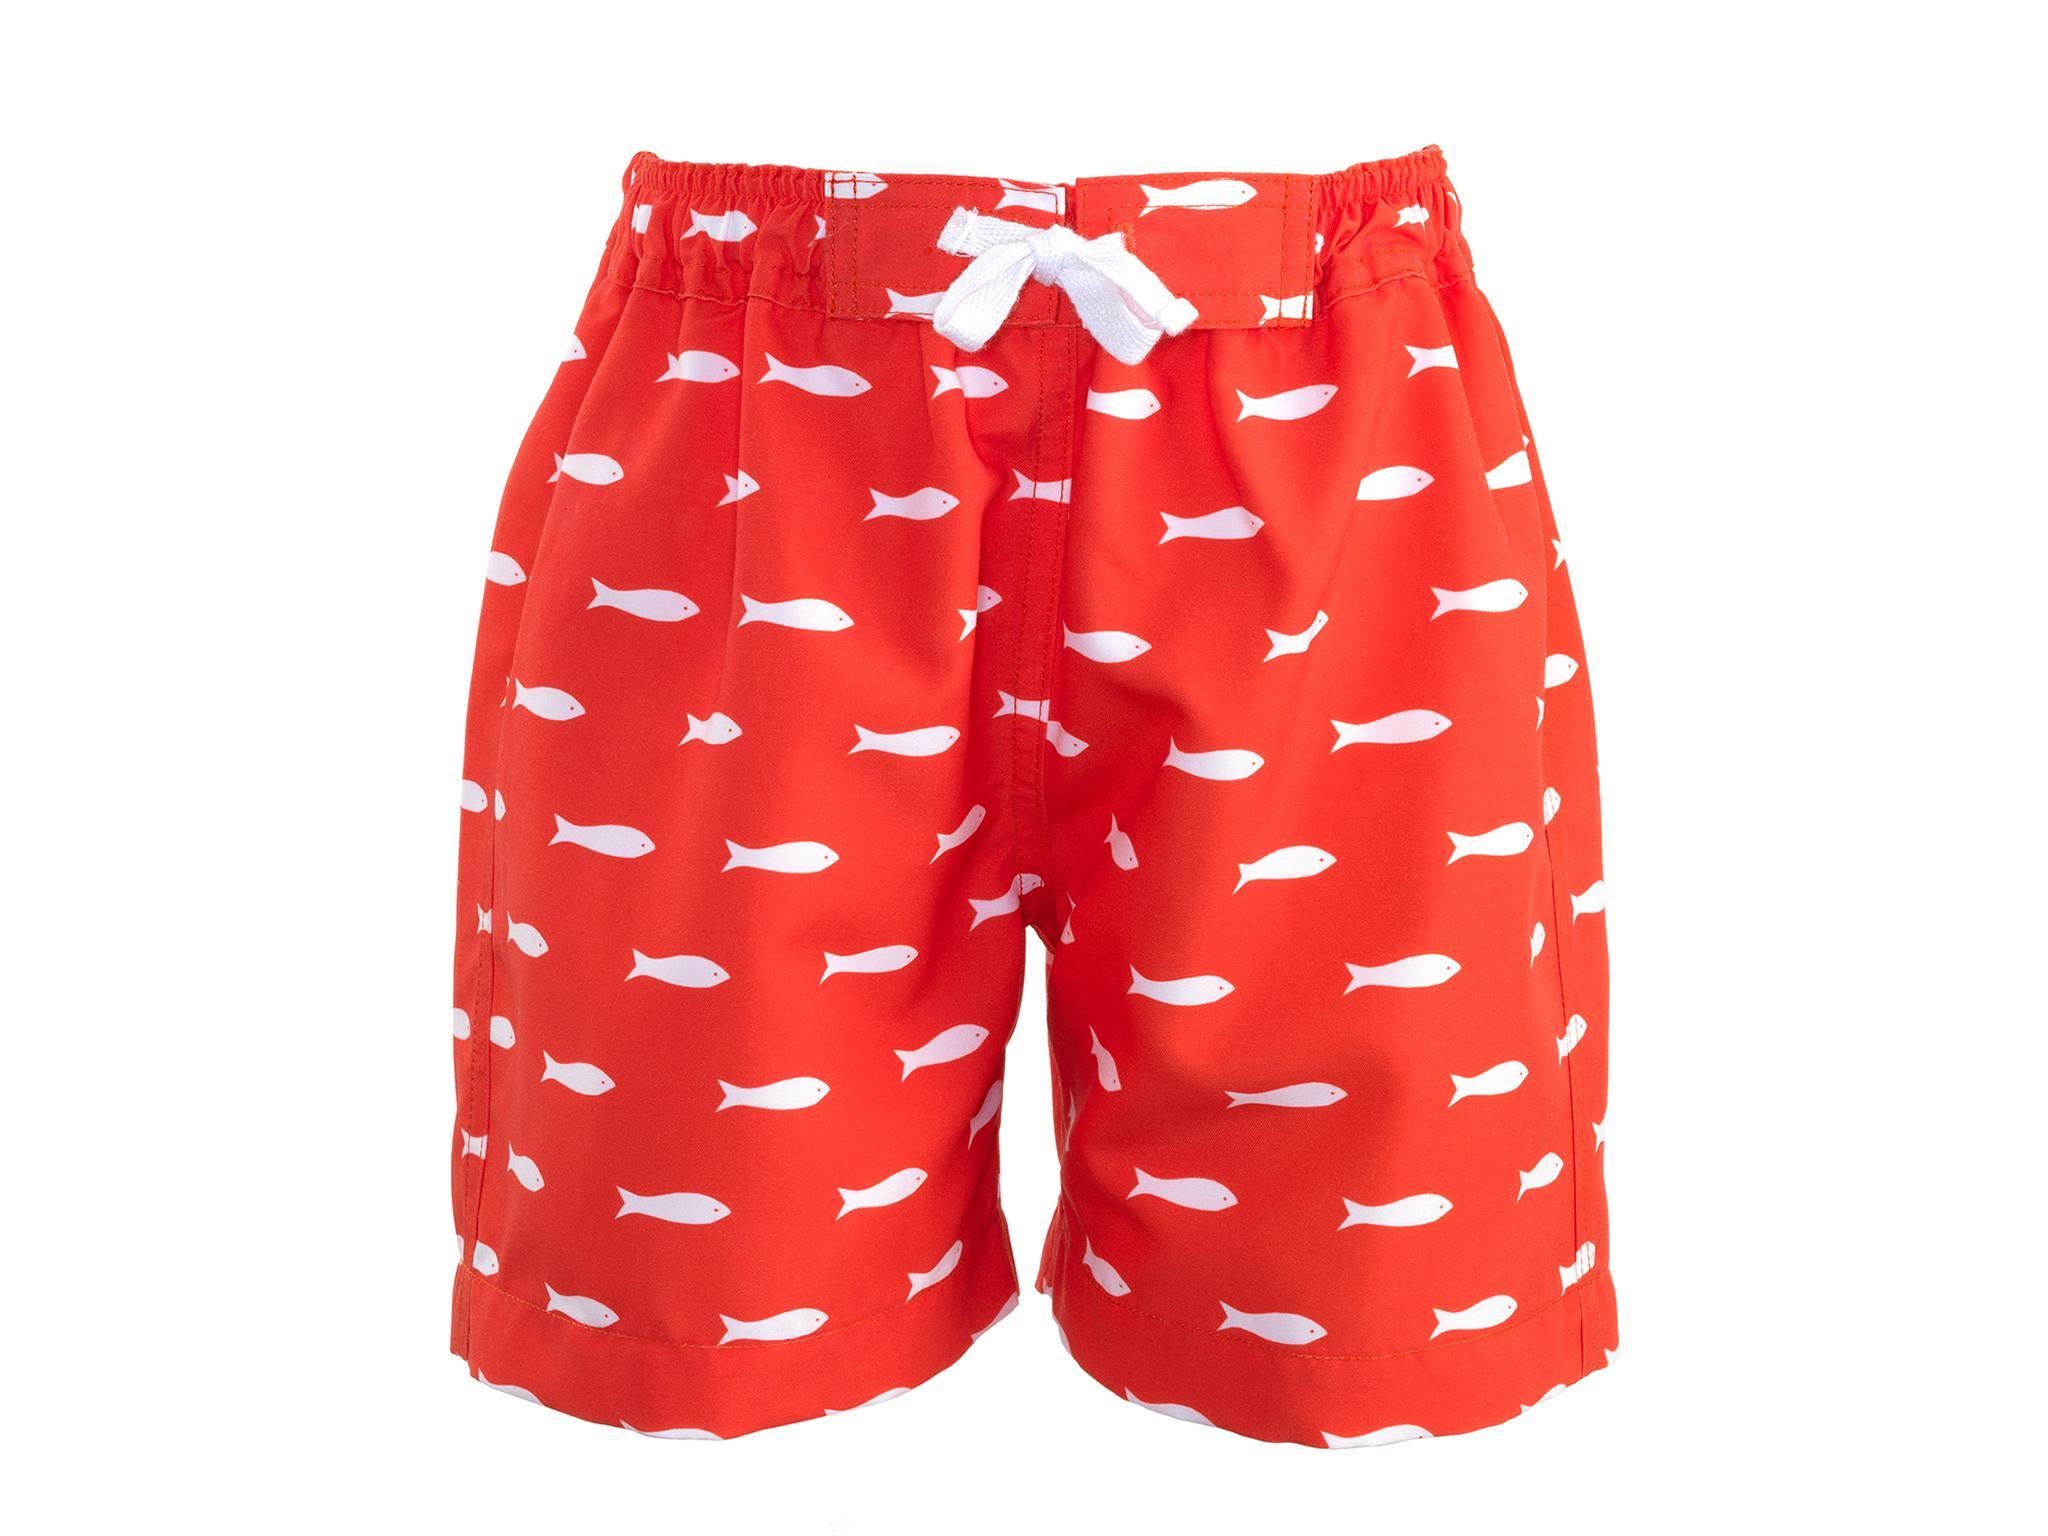 Chu warm Mens Shorts Radiating Black and White Line Running Short Swimsuit Pants for Boys